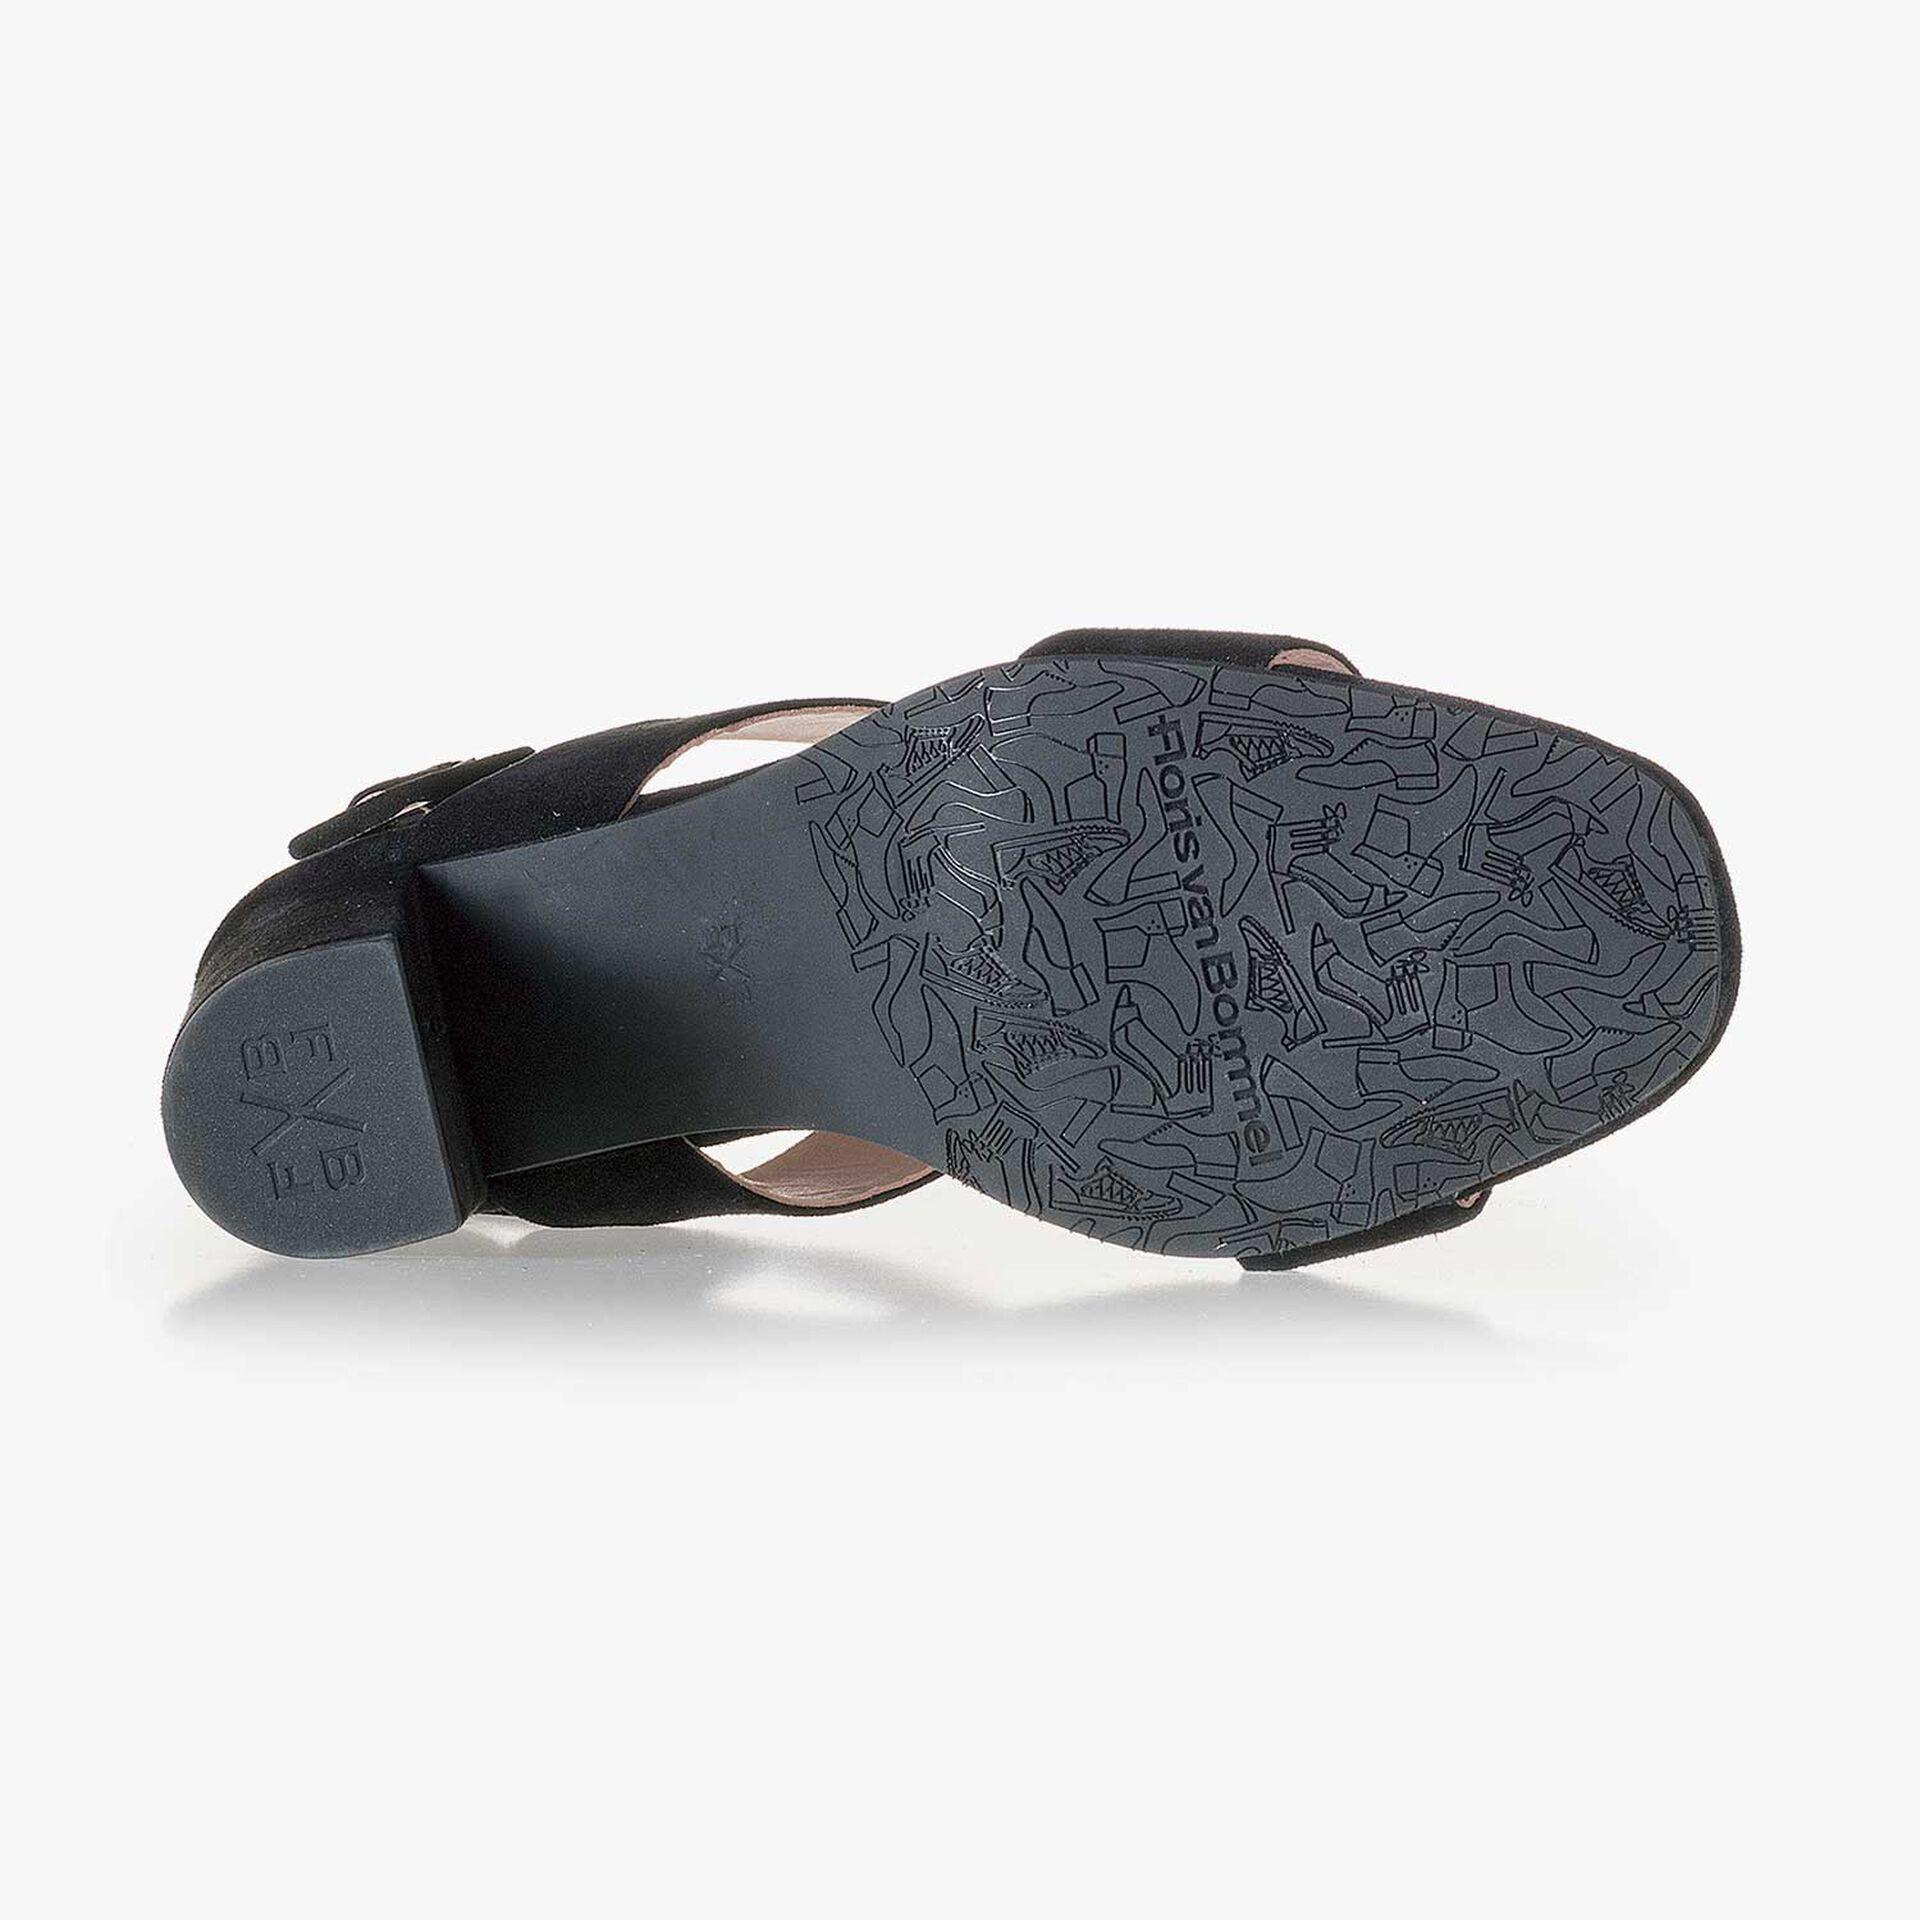 Black suede leather heeled sandal